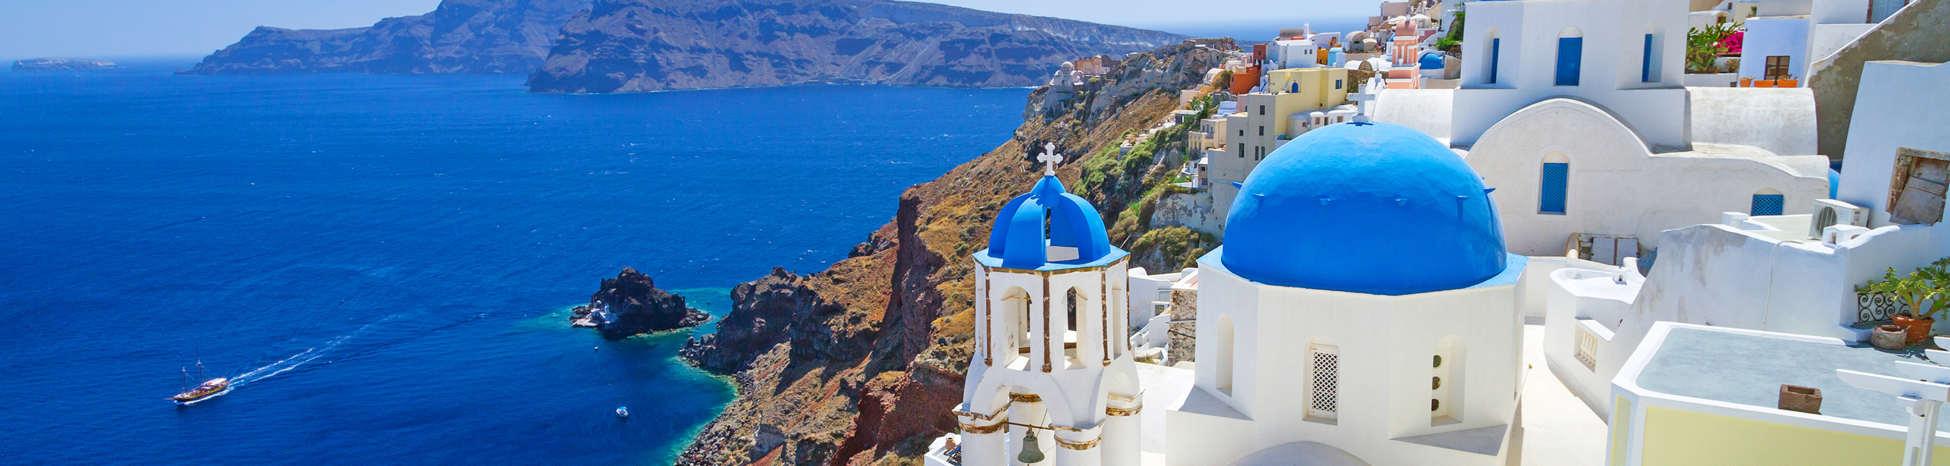 Greece-Santorini-blue-churches-view_shutterstock_132953783